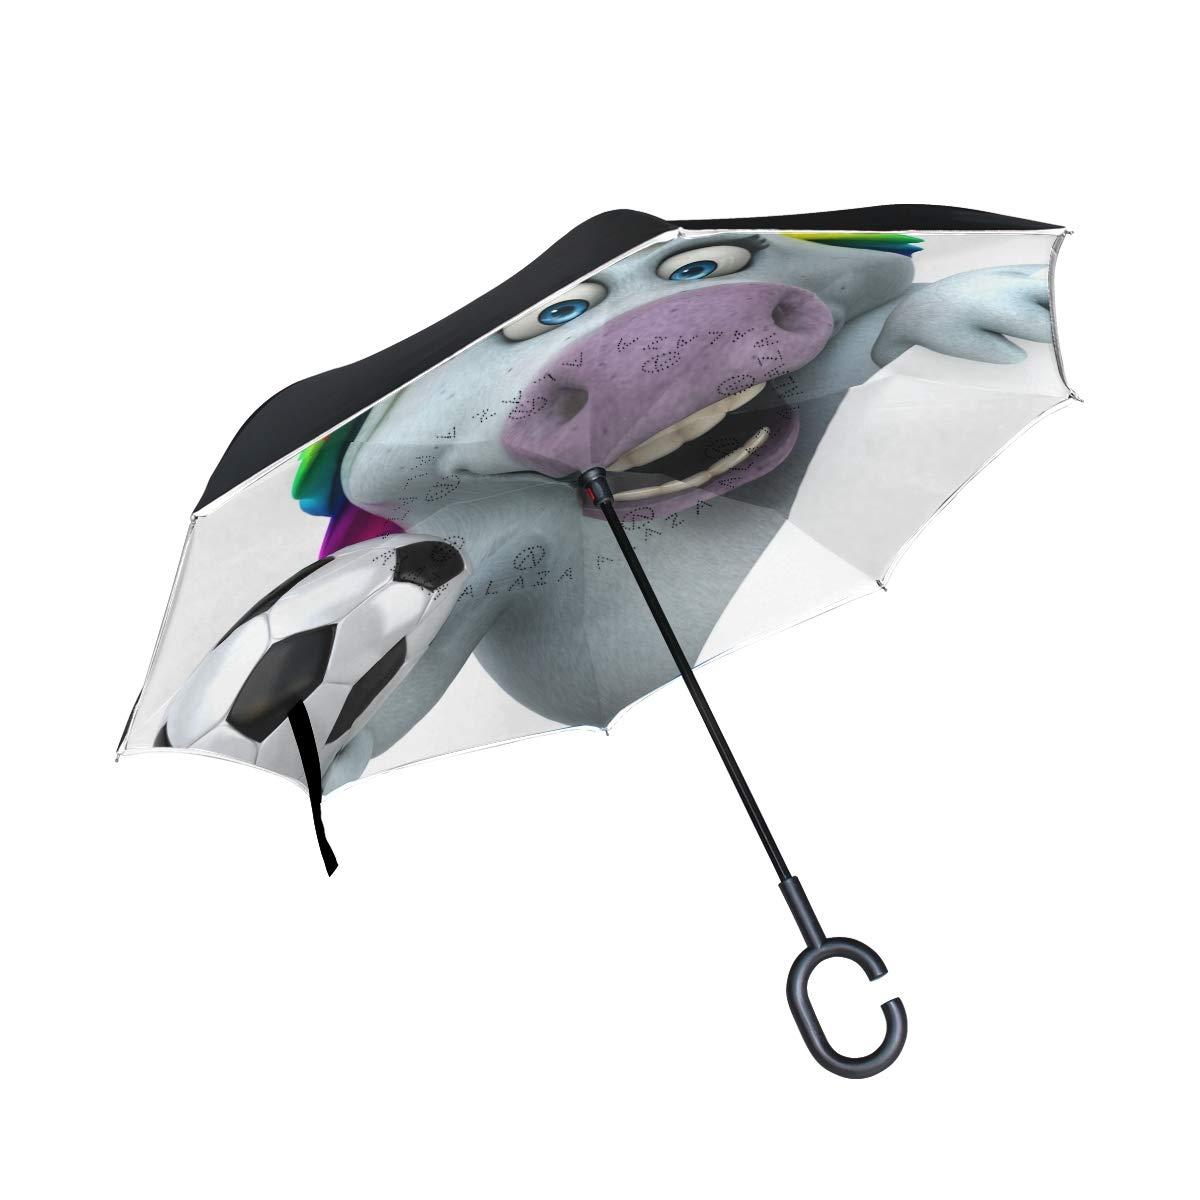 senya Saobao Double Layer Inverted Umbrella Fun Unicorn Reverse Folding Umbrella Windproof UV Rain for Outdoor with C-Shaped Handle